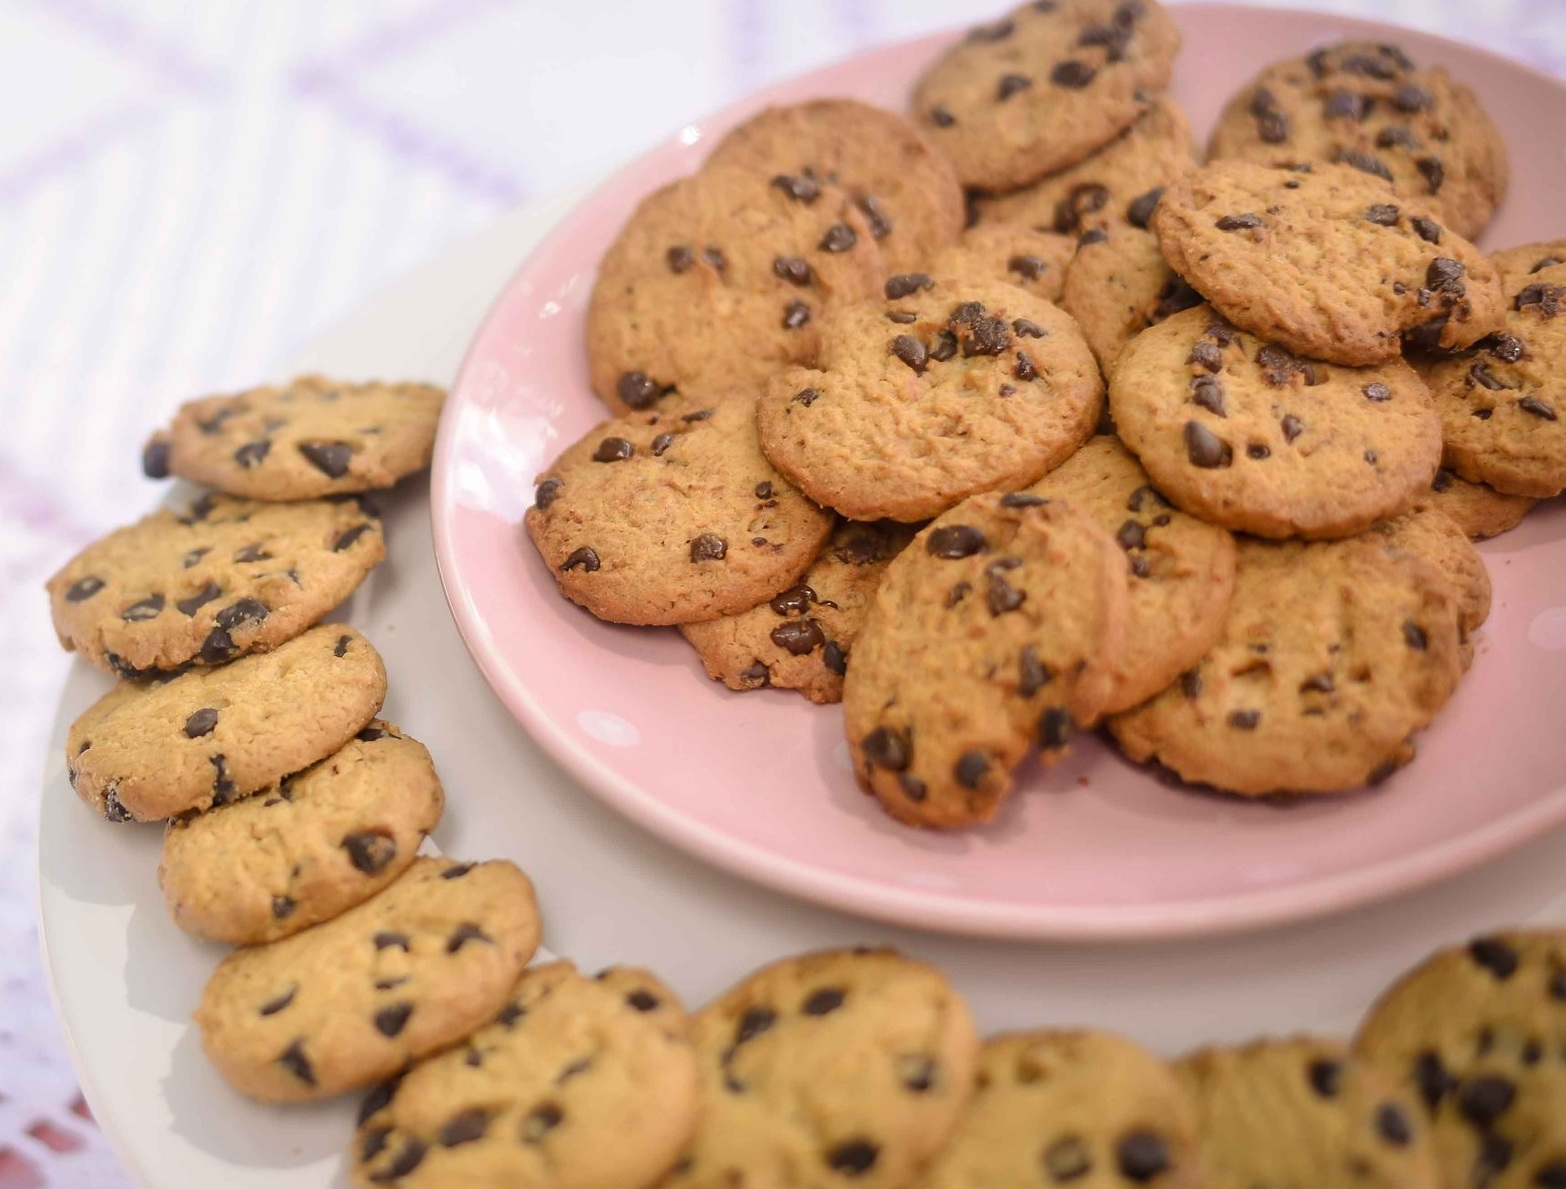 baking-breakfast-chocolat-1020585.jpg